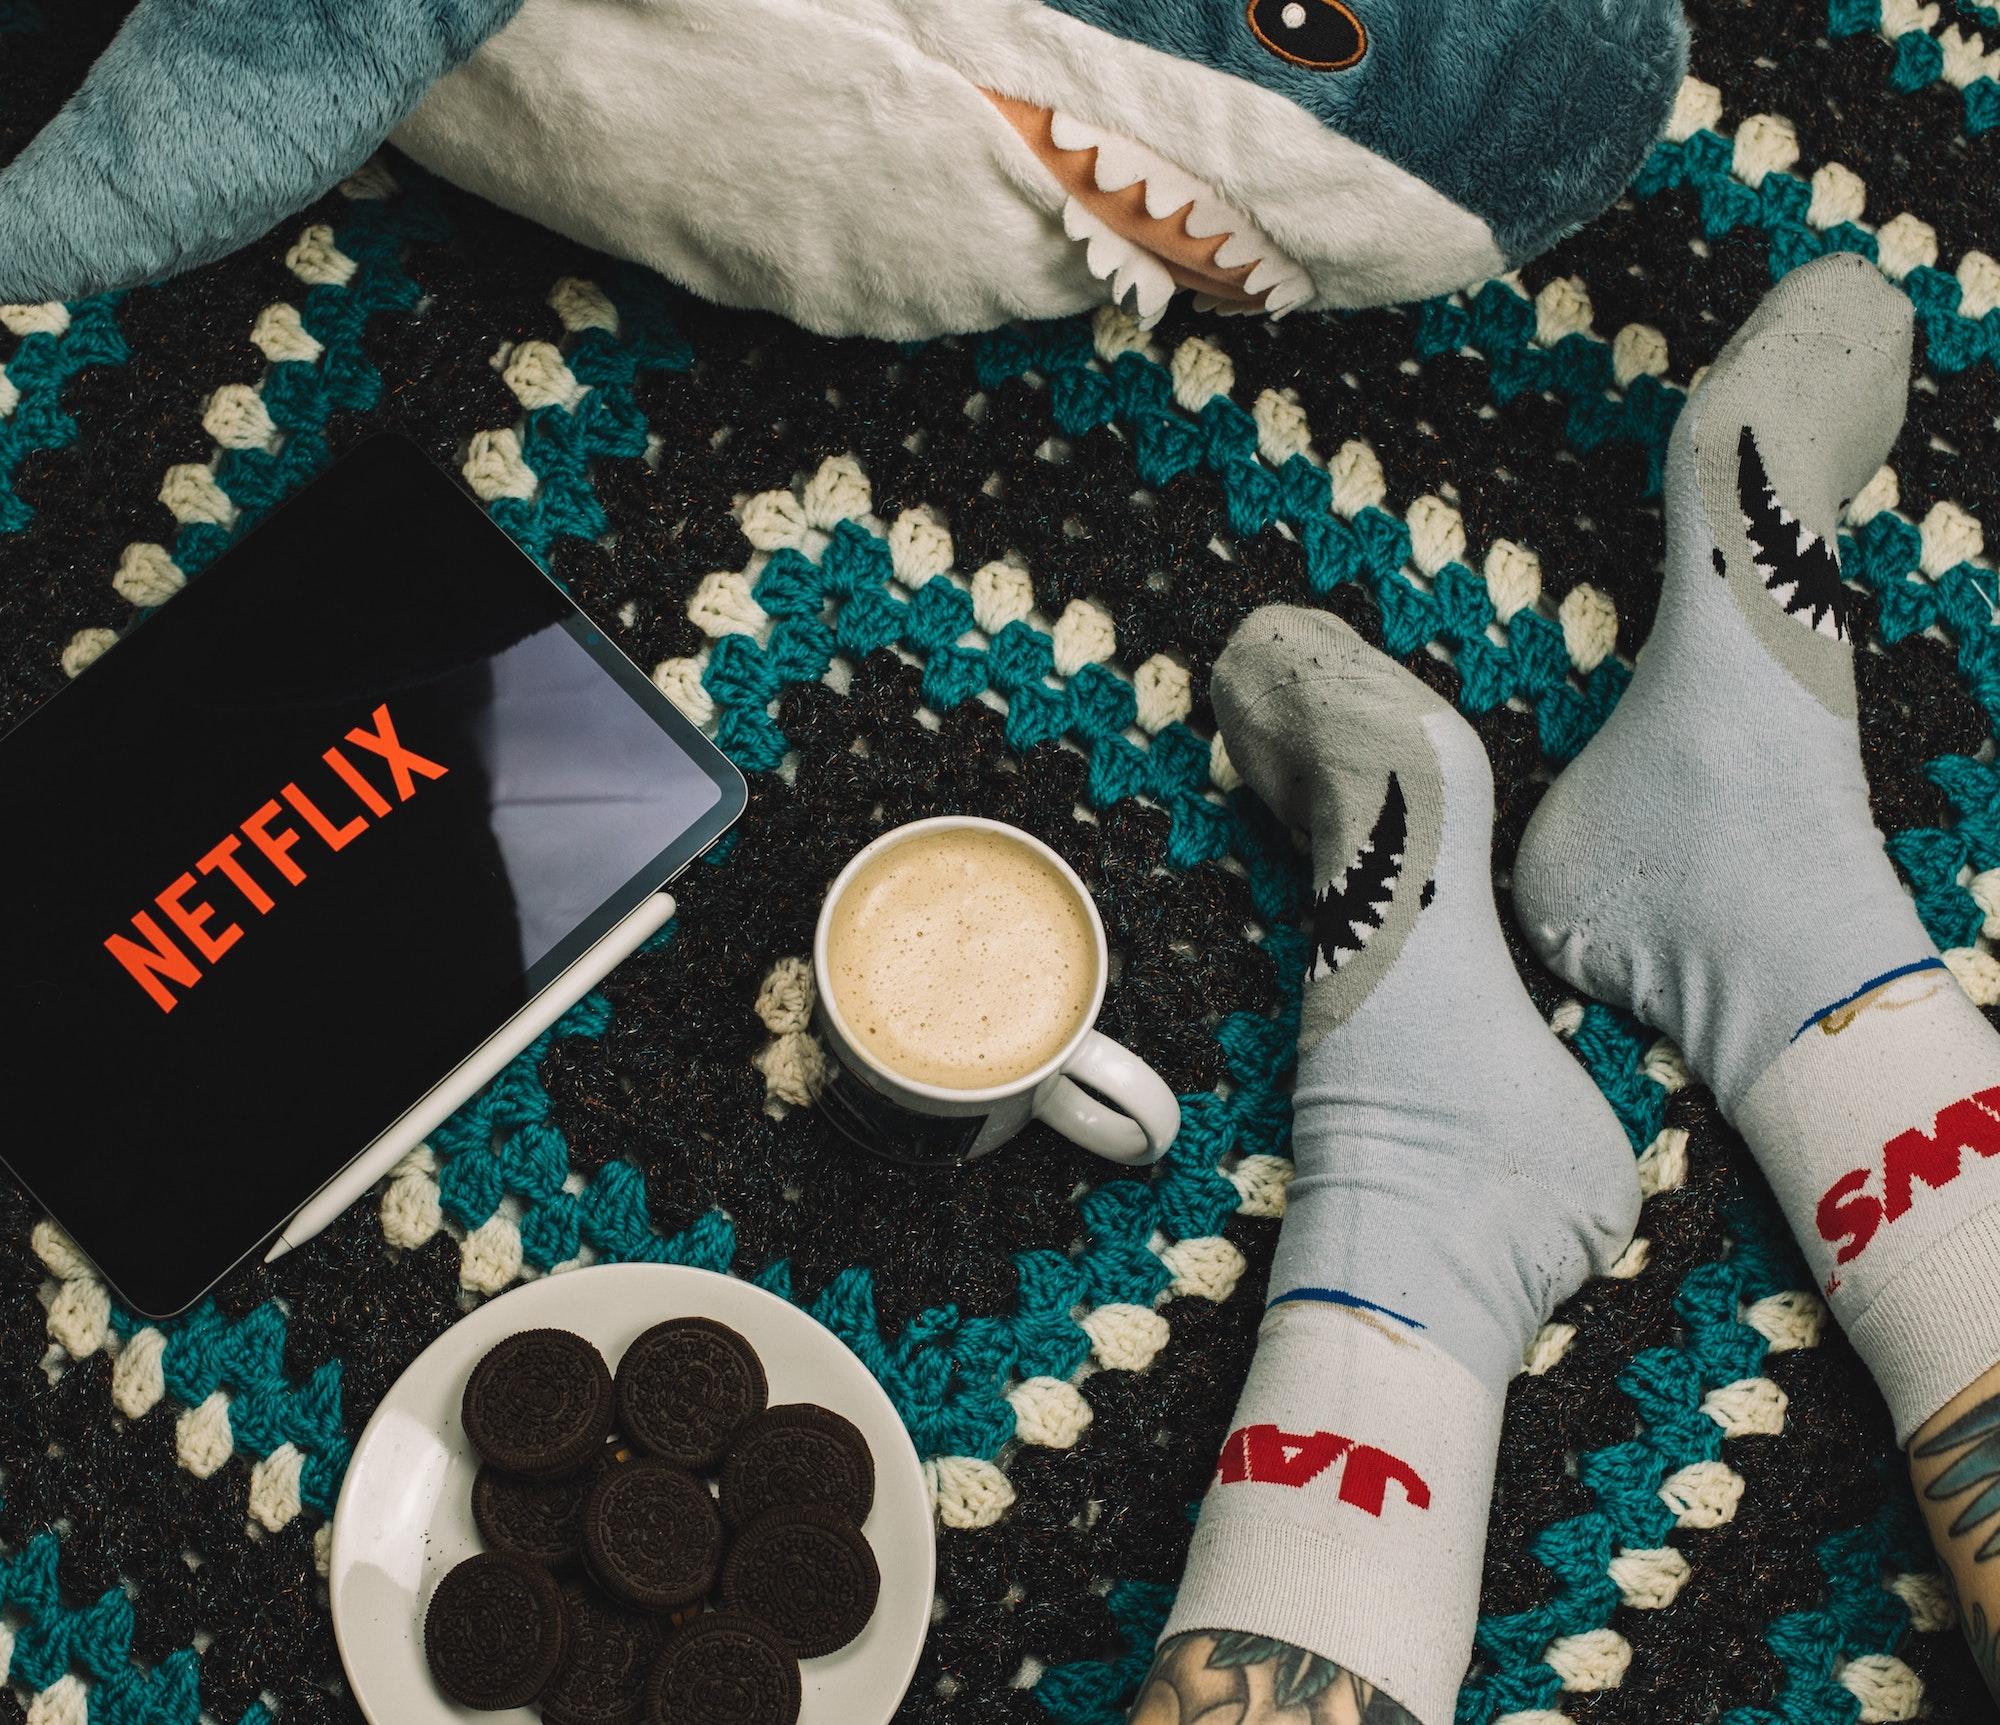 Virtual Night In How to make Netflix nights better | Technology | Elle Blonde Luxury Lifestyle Destination Blog